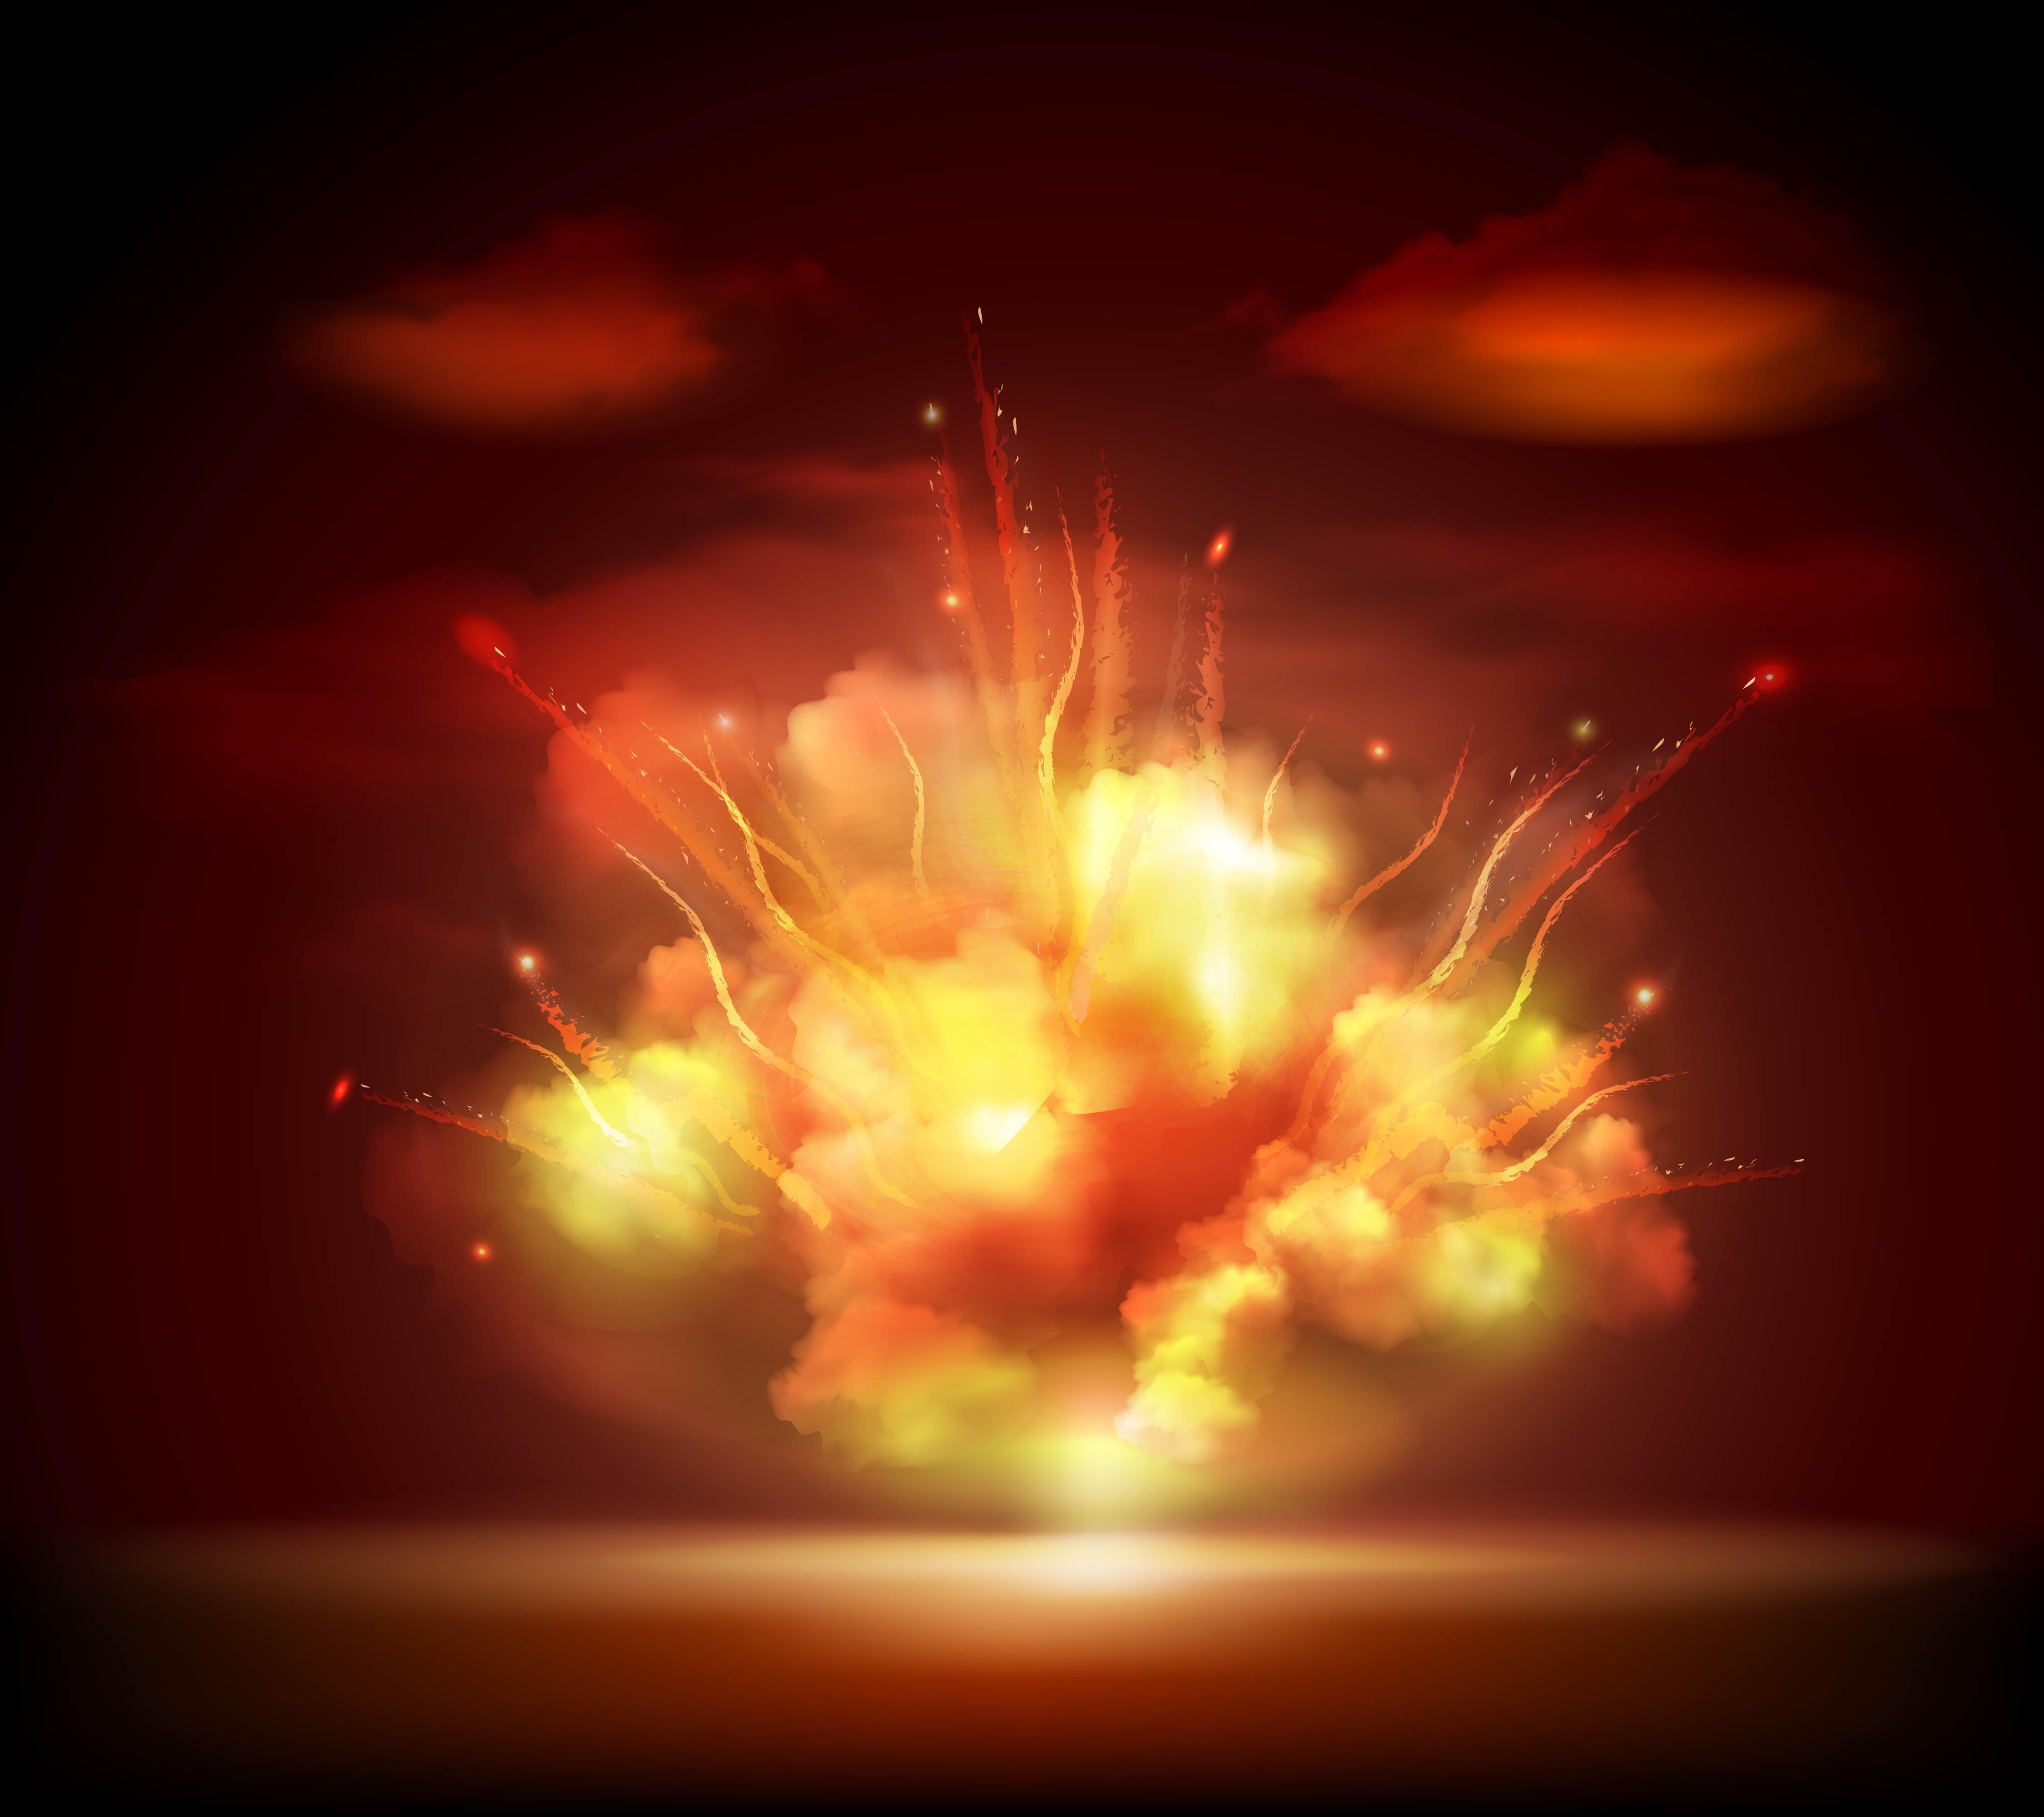 Night Explosion Background Banner